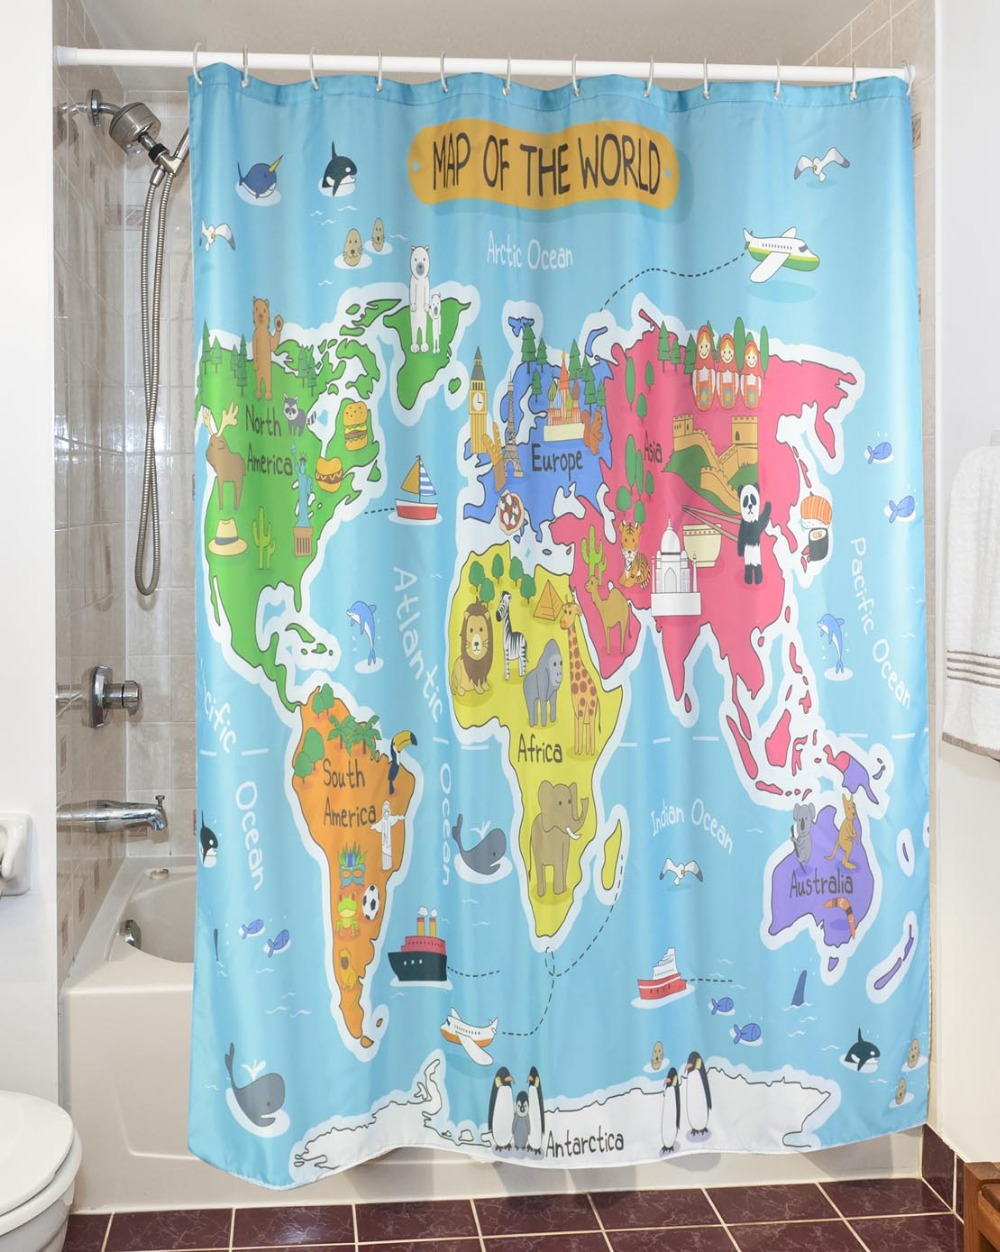 Shower curtain colorful kids world maps decor printing waterproof 3d new cartoon world map waterproof shower curtain polyester fabric curtain for bathroom bath curtain cortinas gumiabroncs Images